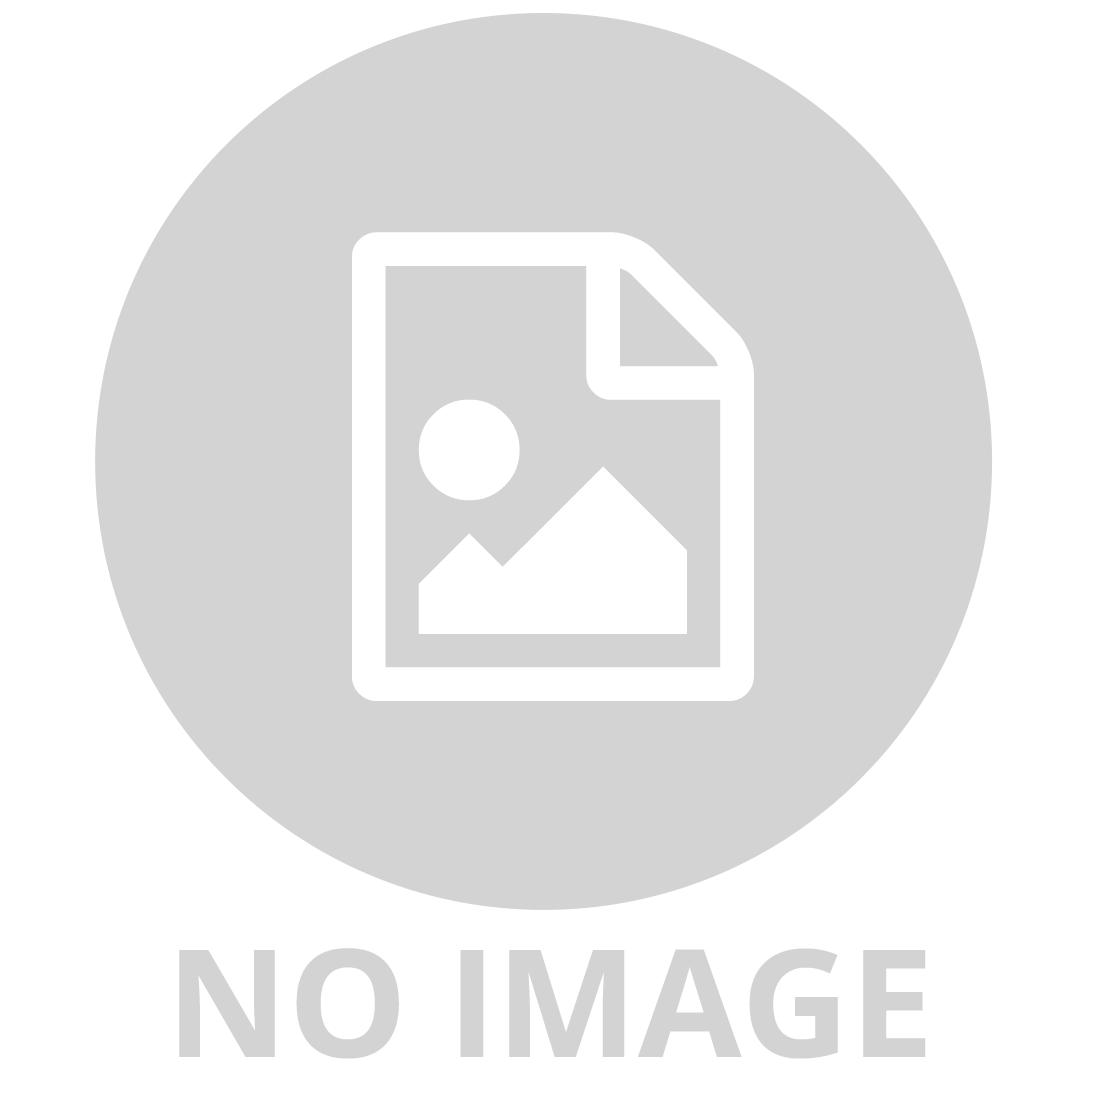 RAVENSBURGER 35 PCE JIGSAW PUZZLE ANIMAL KINGDOM